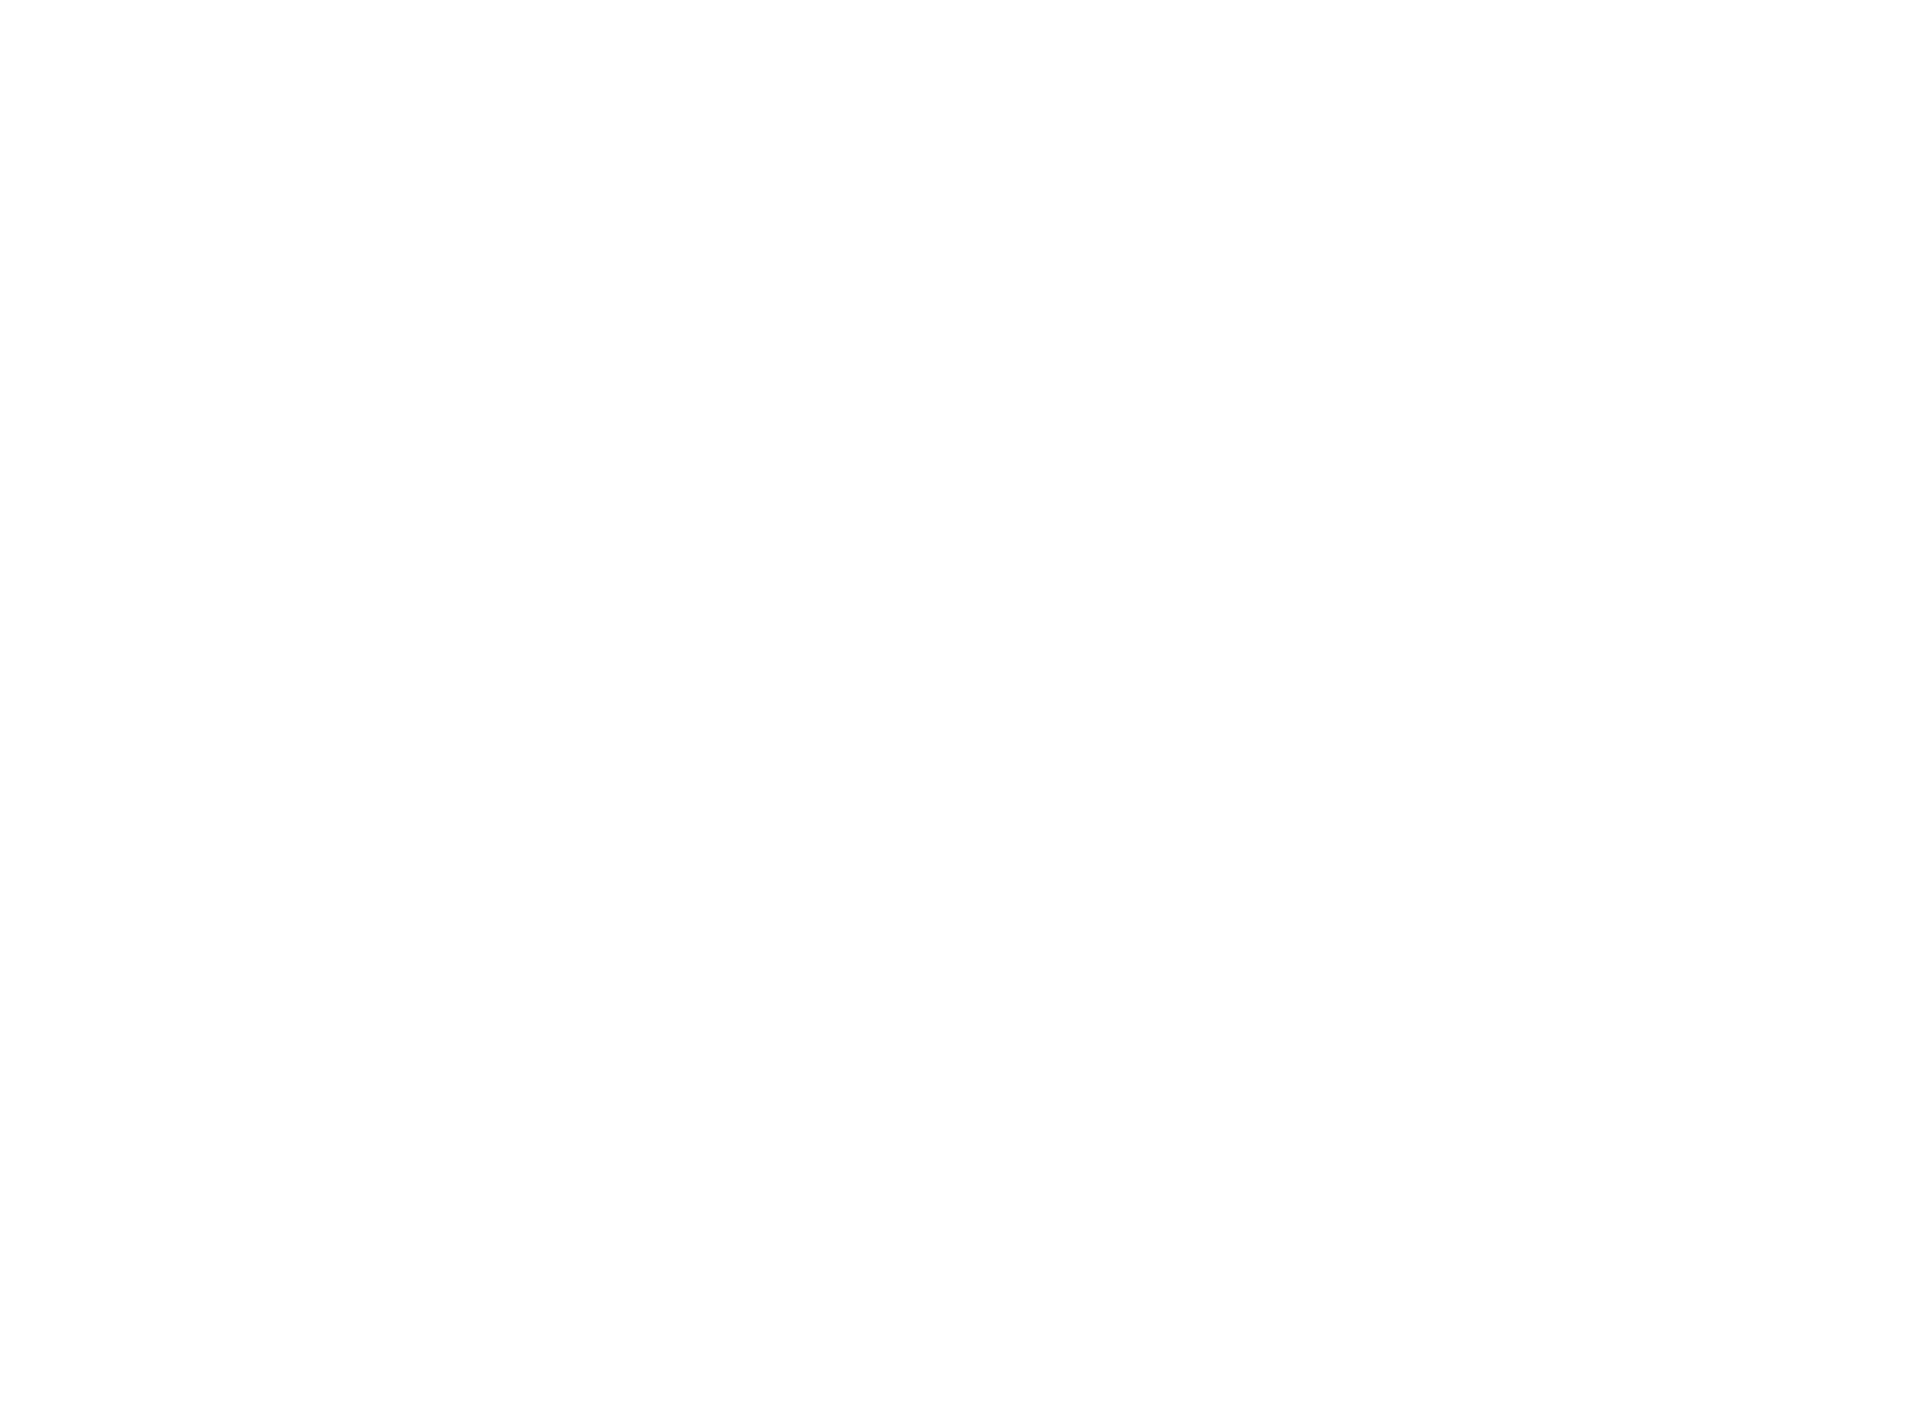 1770 Tattoo studio in Brighton UK with the team of tattoo artists Alex Binnie, Adam Sage, Jack Thomas Newton, Zoe Binnie, Francesco Capro, Alex Newey and Mie Sato - hand poke, traditional, Japanese, old school and Neotrad tattoos.